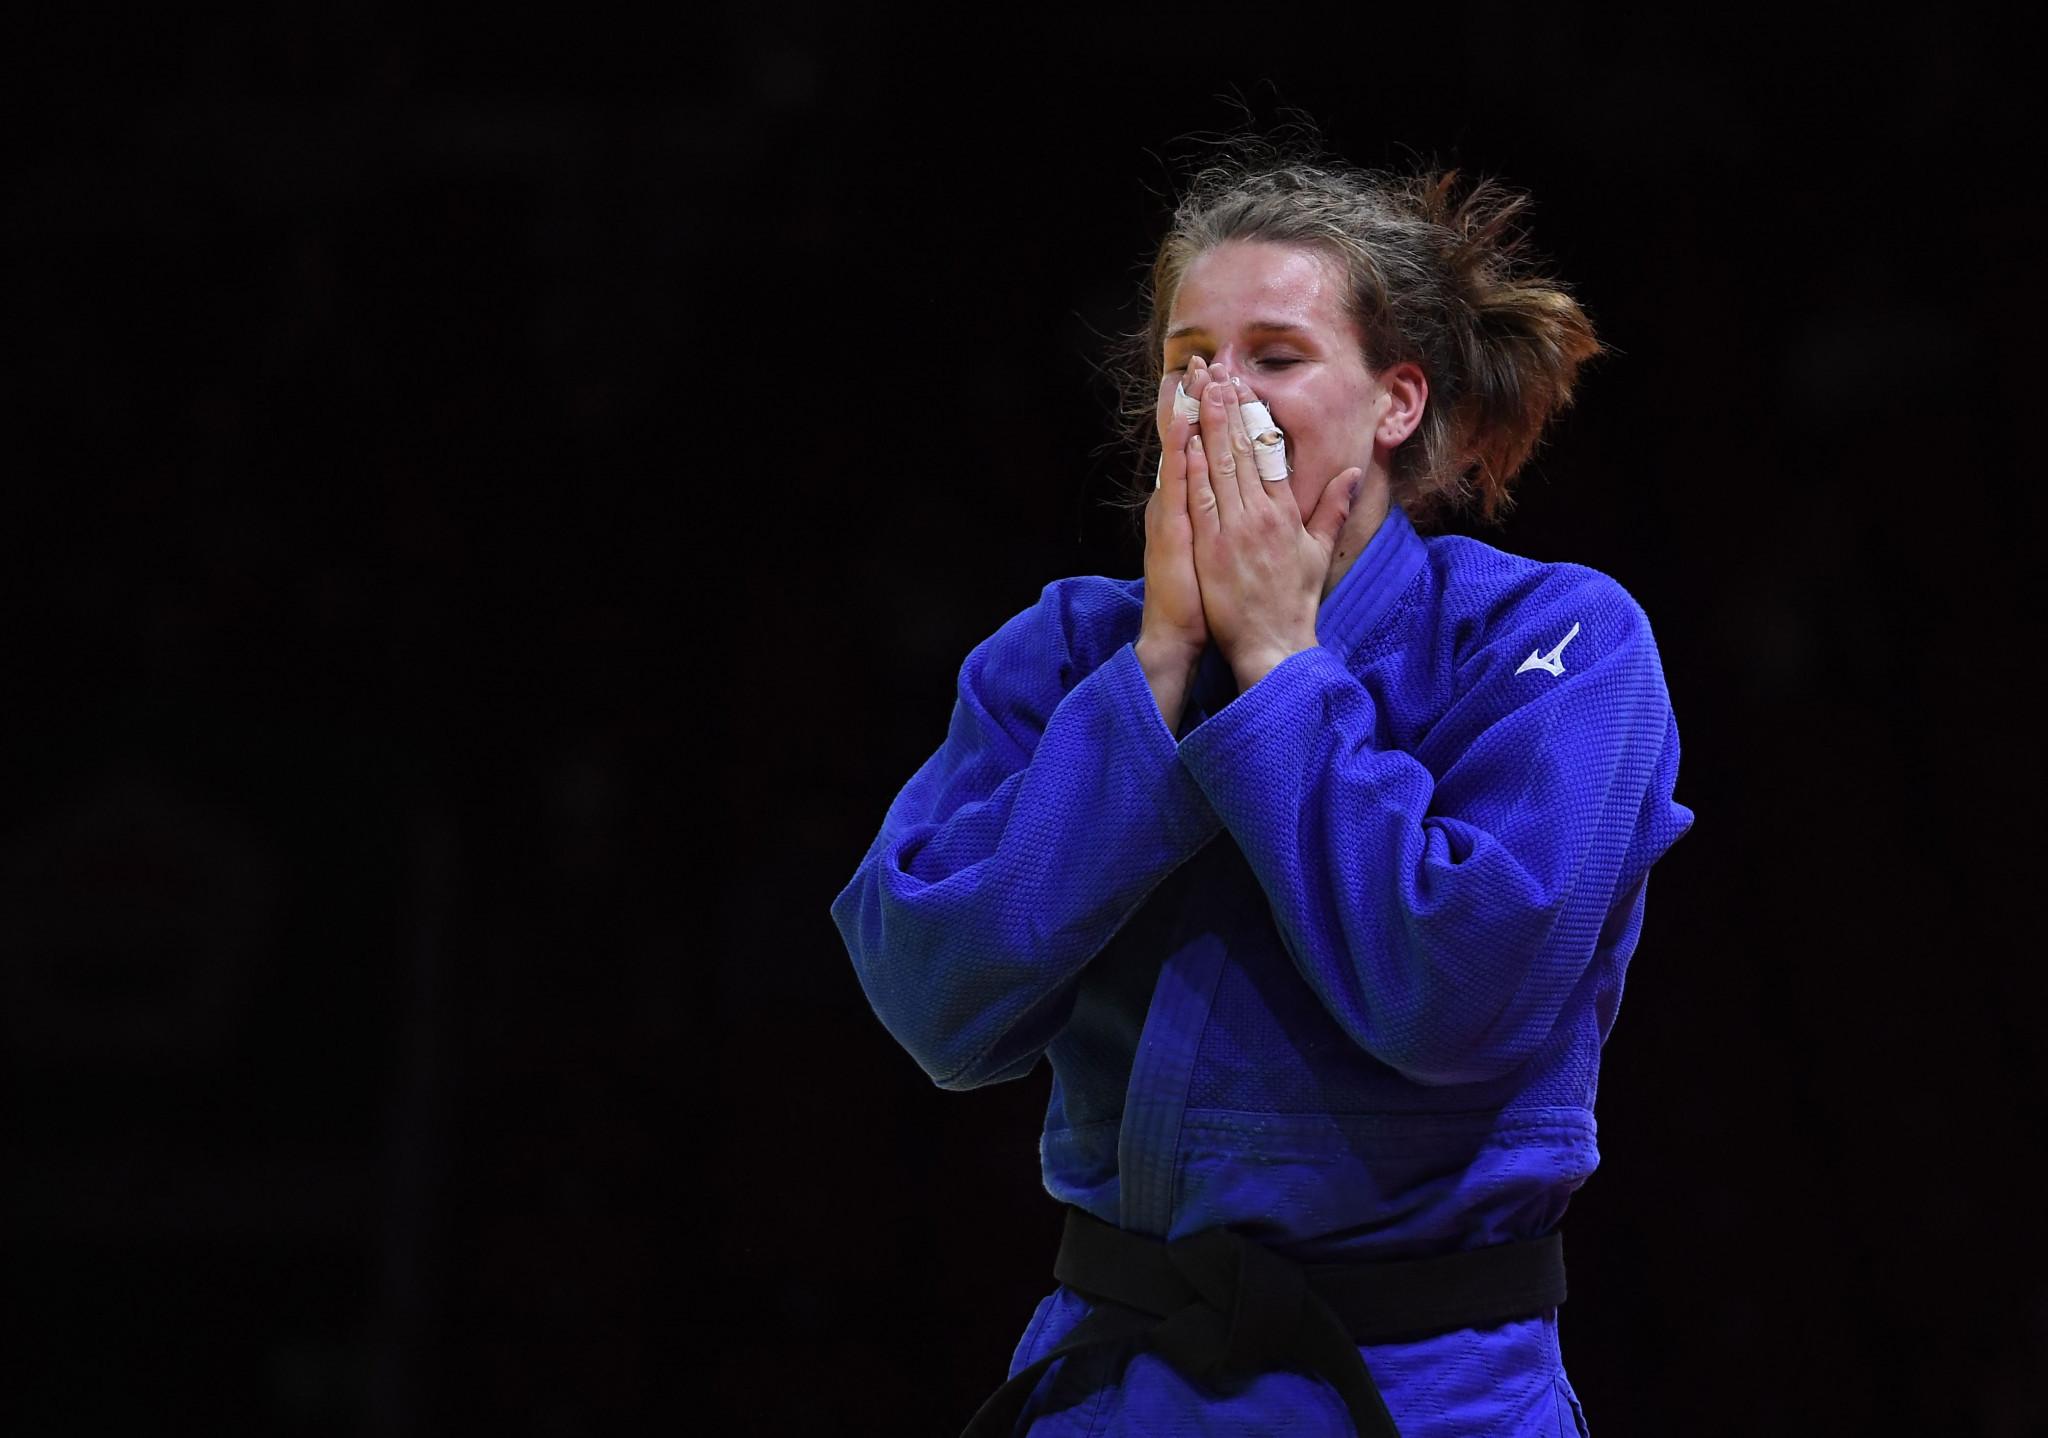 Wagner defeats reigning champion Malonga at IJF World Championships